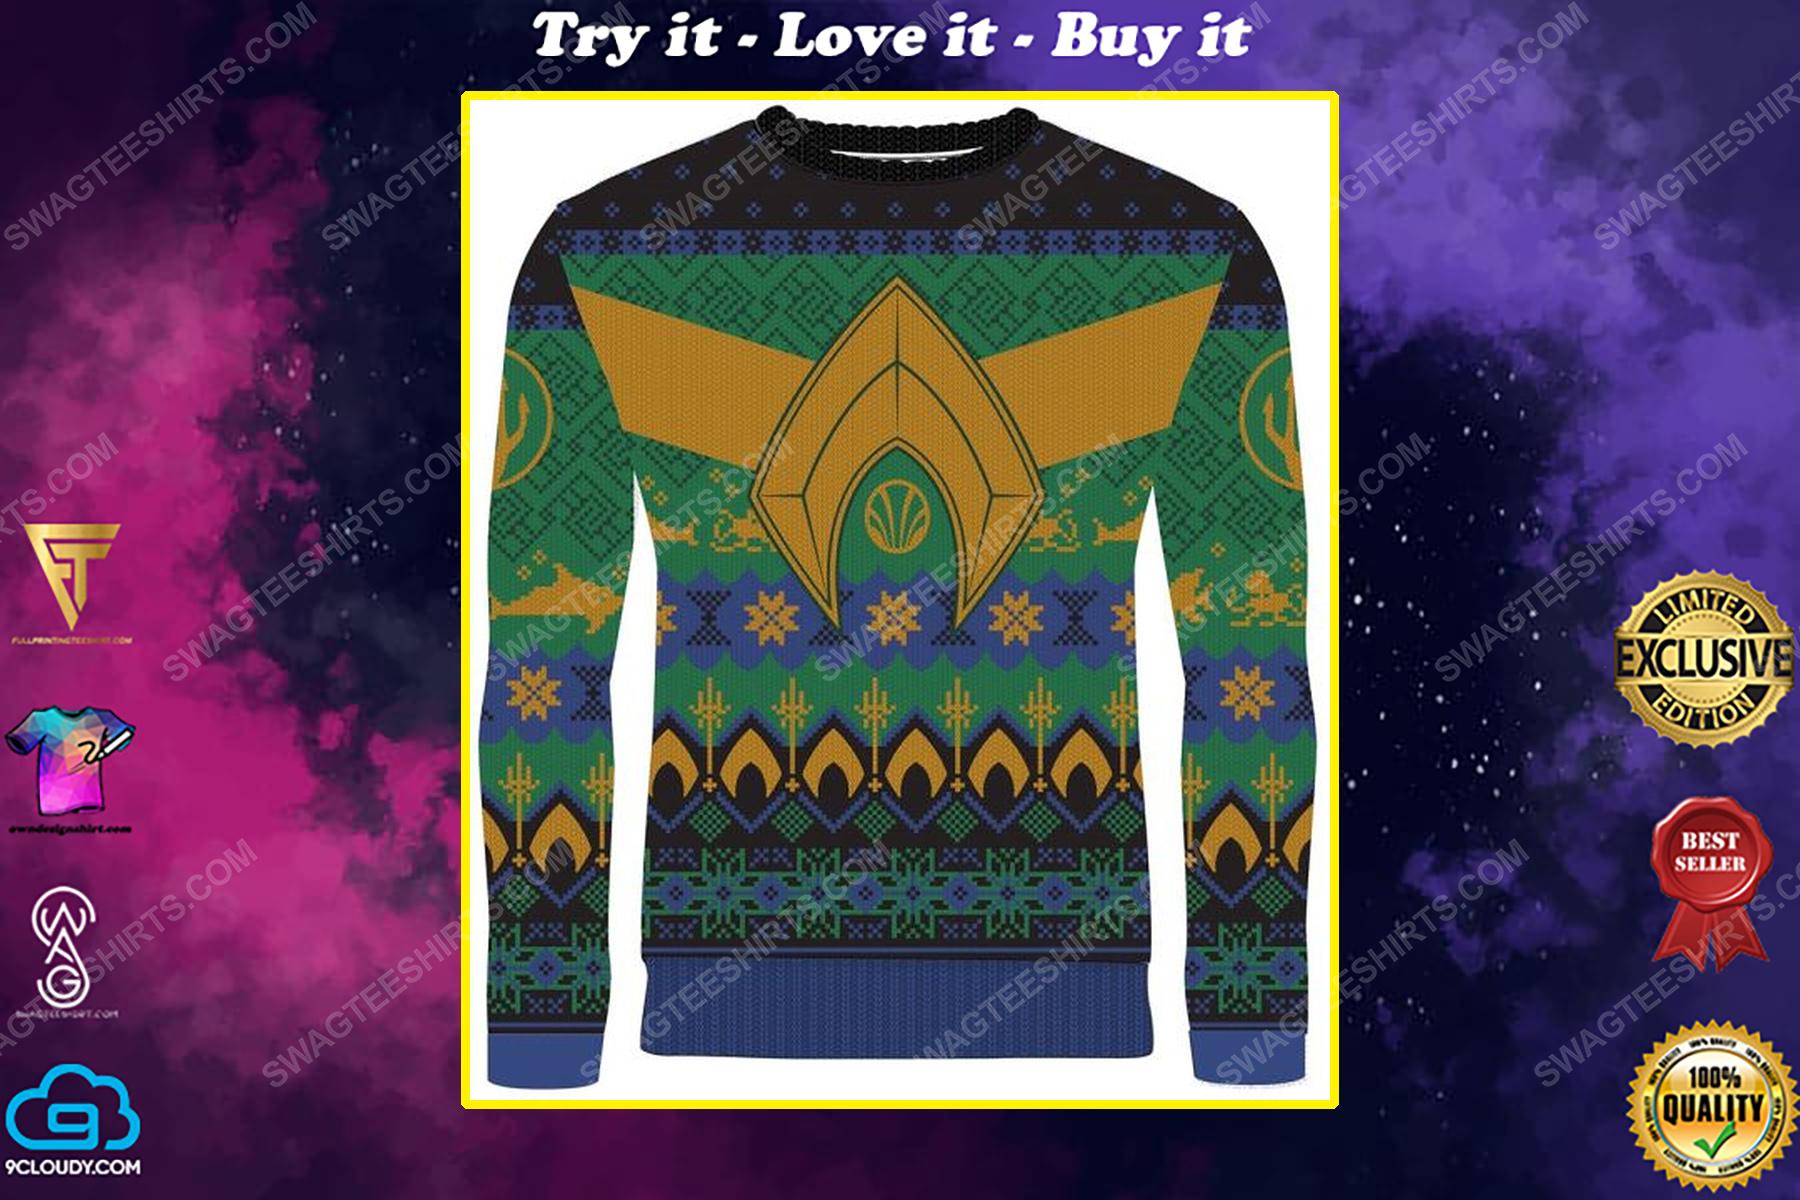 Atlantean tidings full print ugly christmas sweater